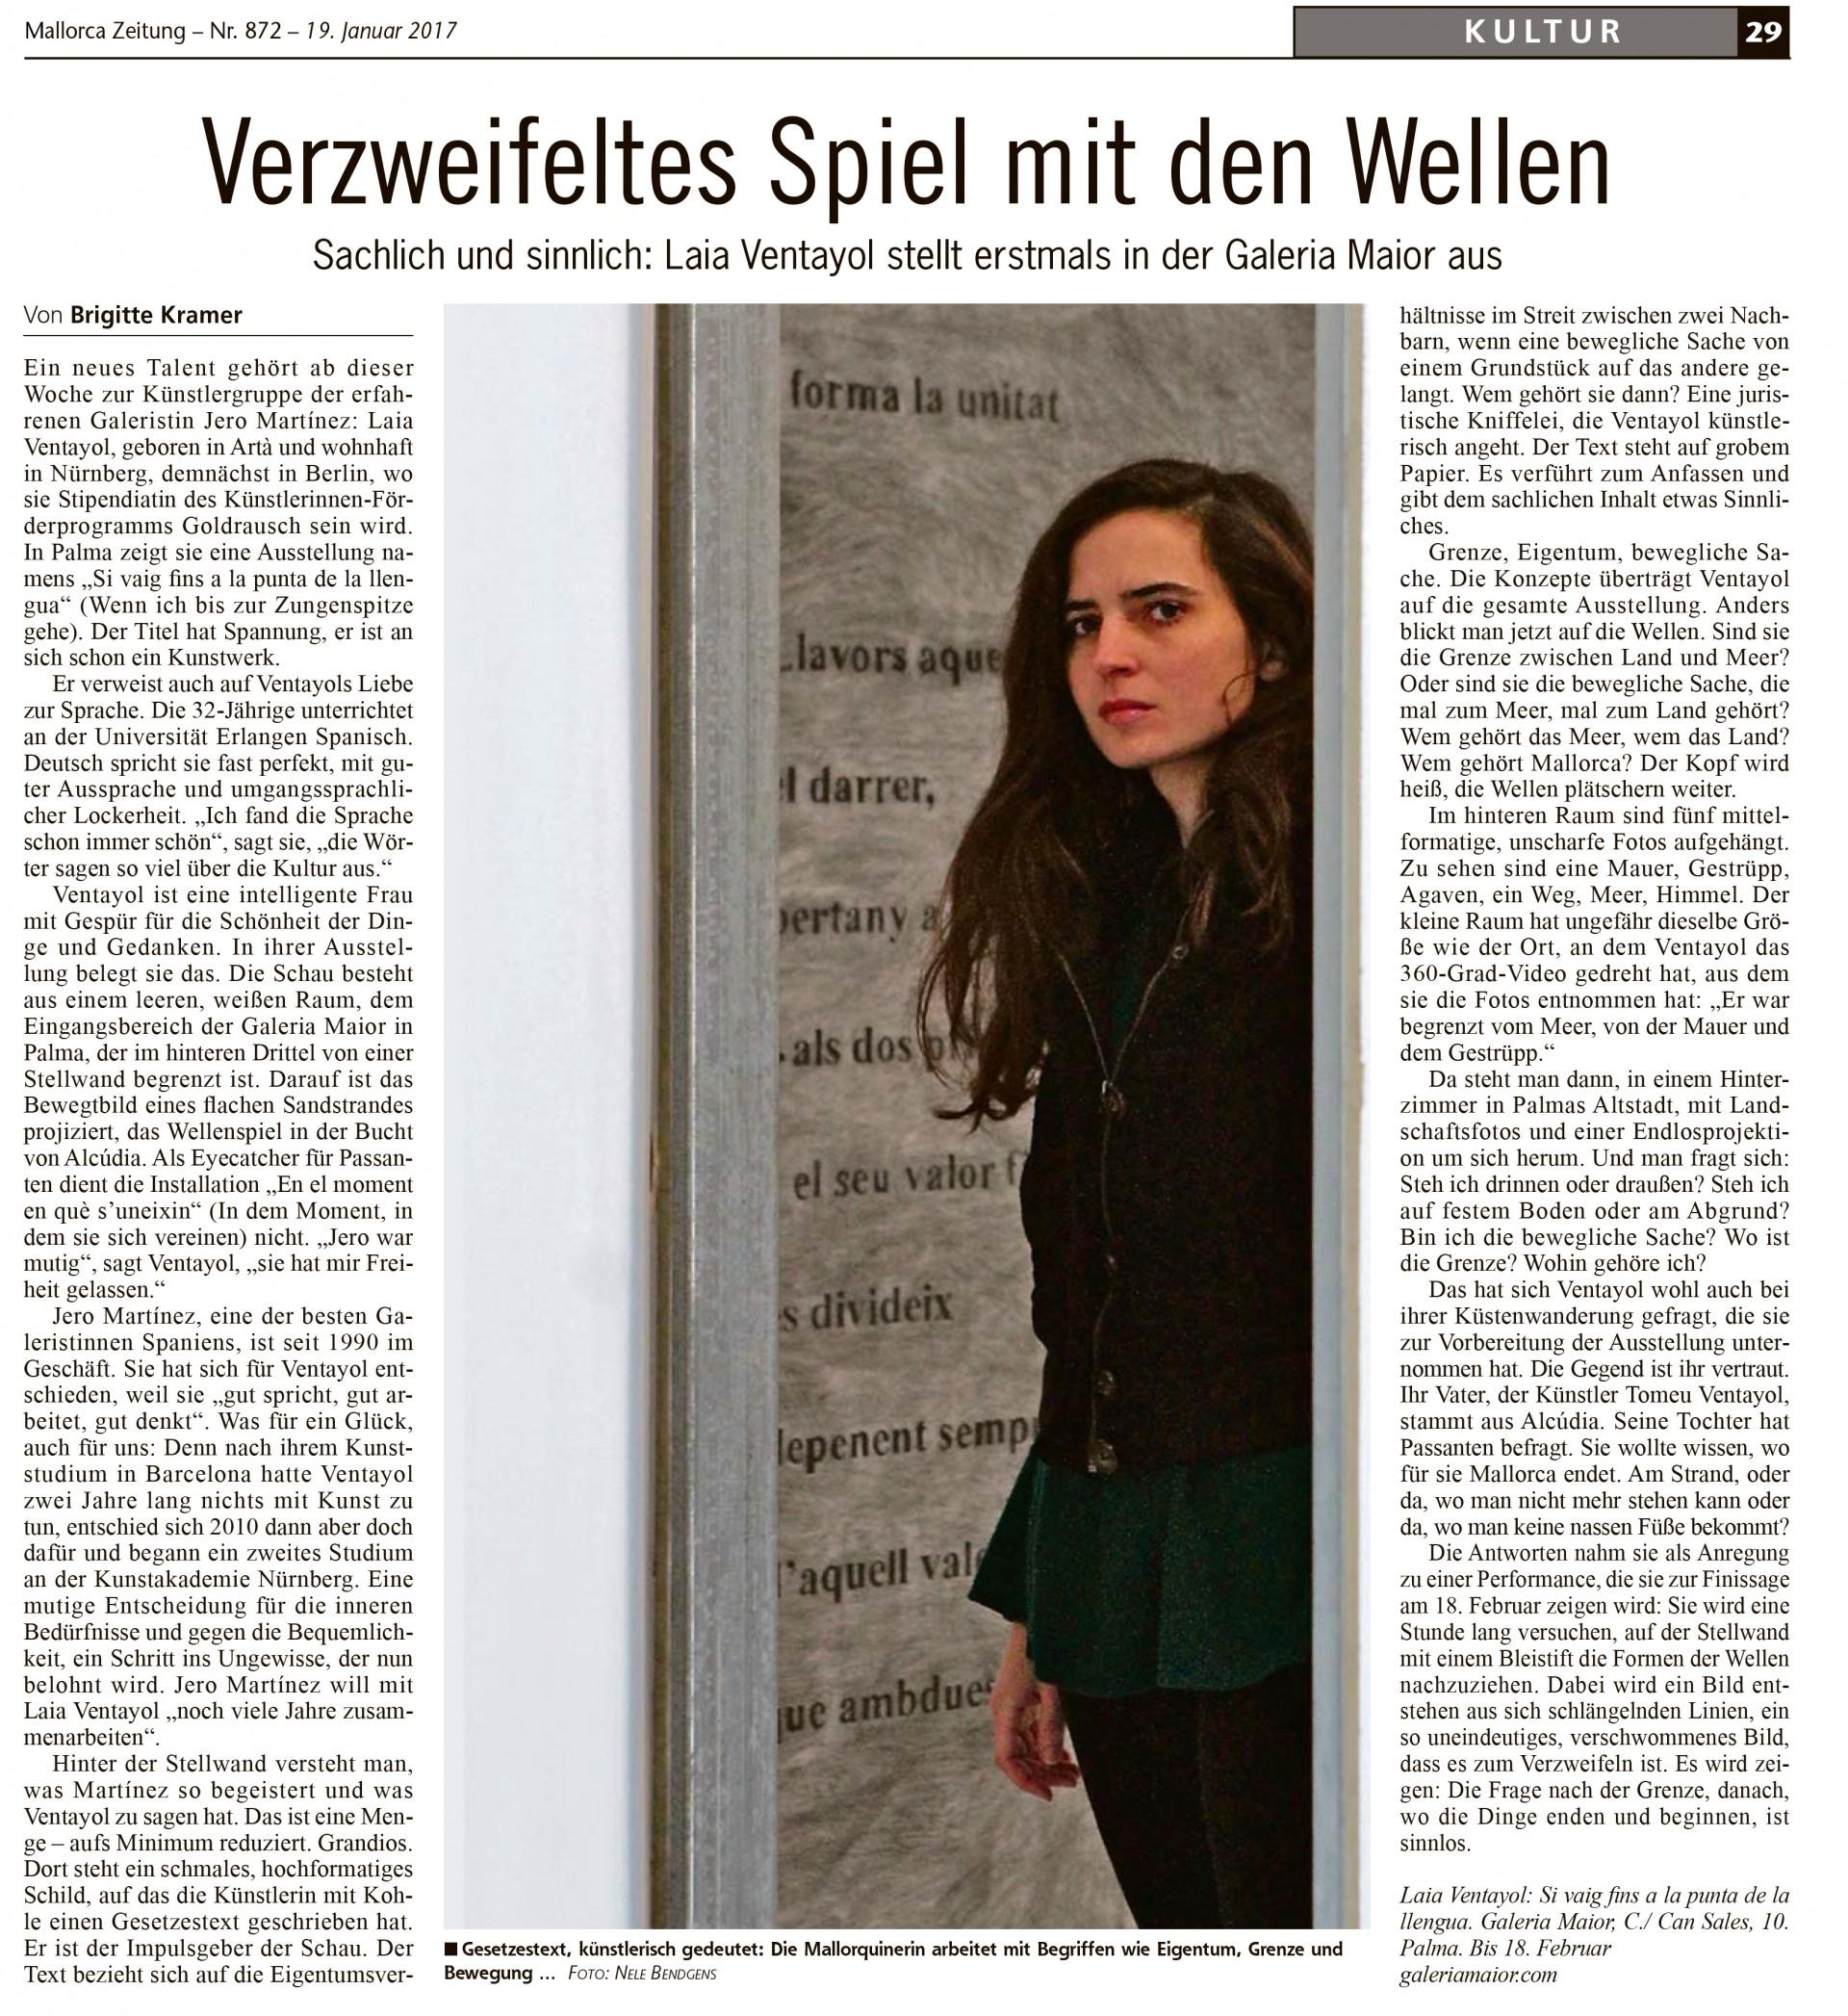 Laia Ventayol Mallorca Zeitung, Brigitte Kramer